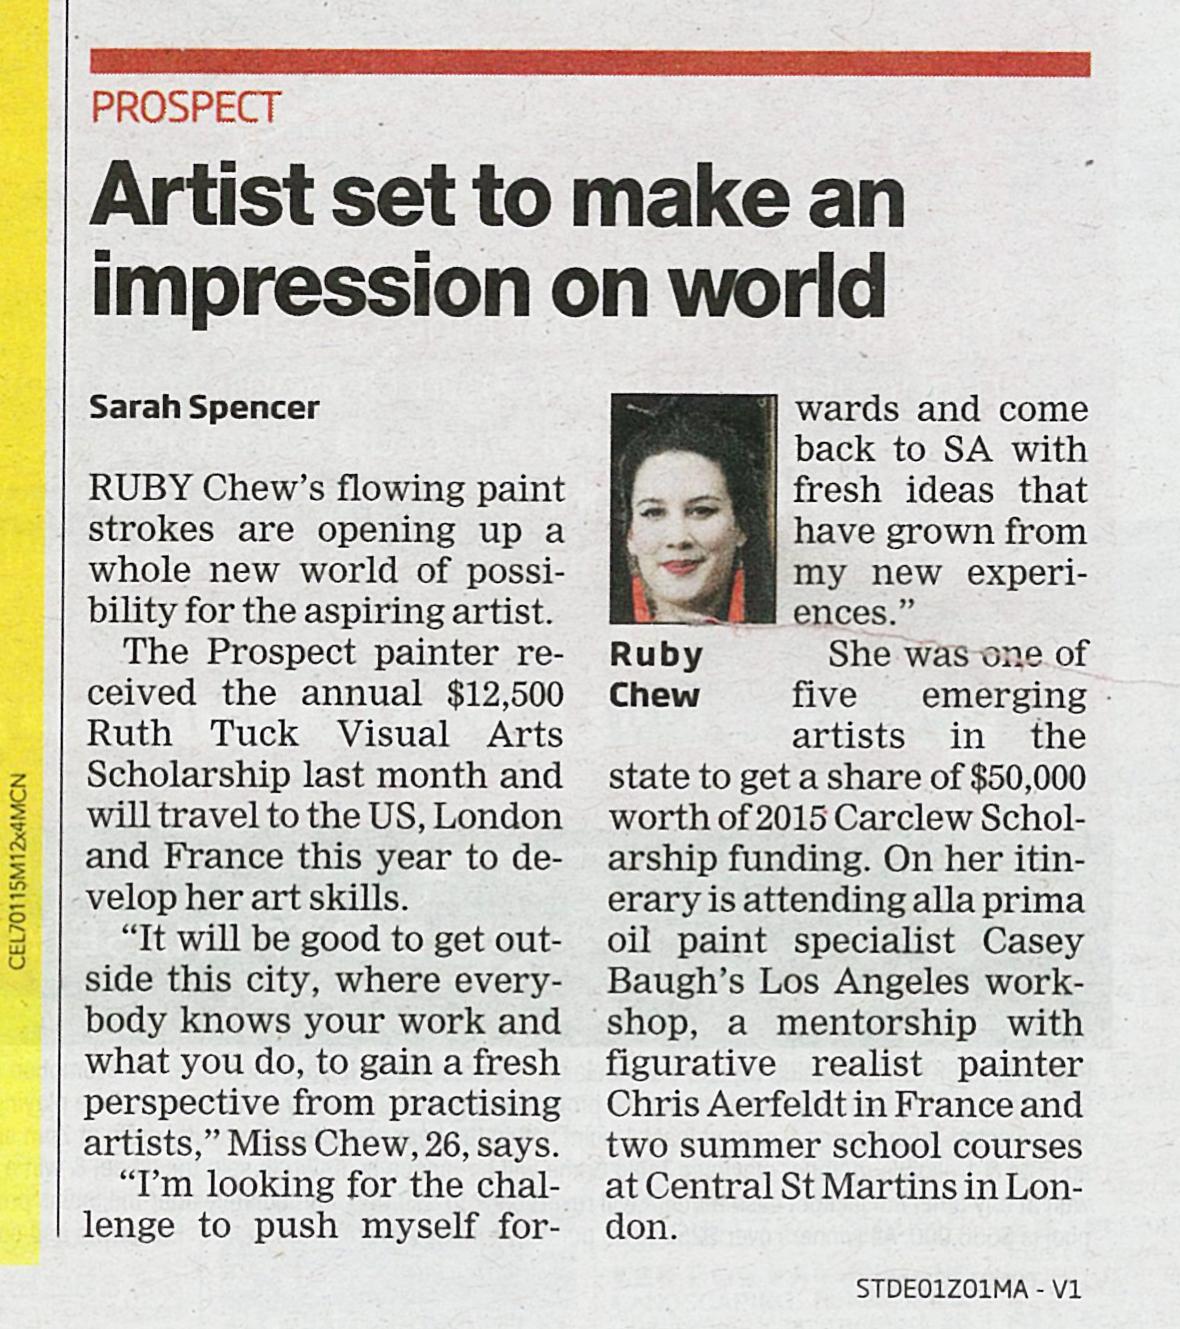 Spenser S,  Ruby Chew's Day, Artist Set to Make Impression on World,  The Messenger, Jan 2015